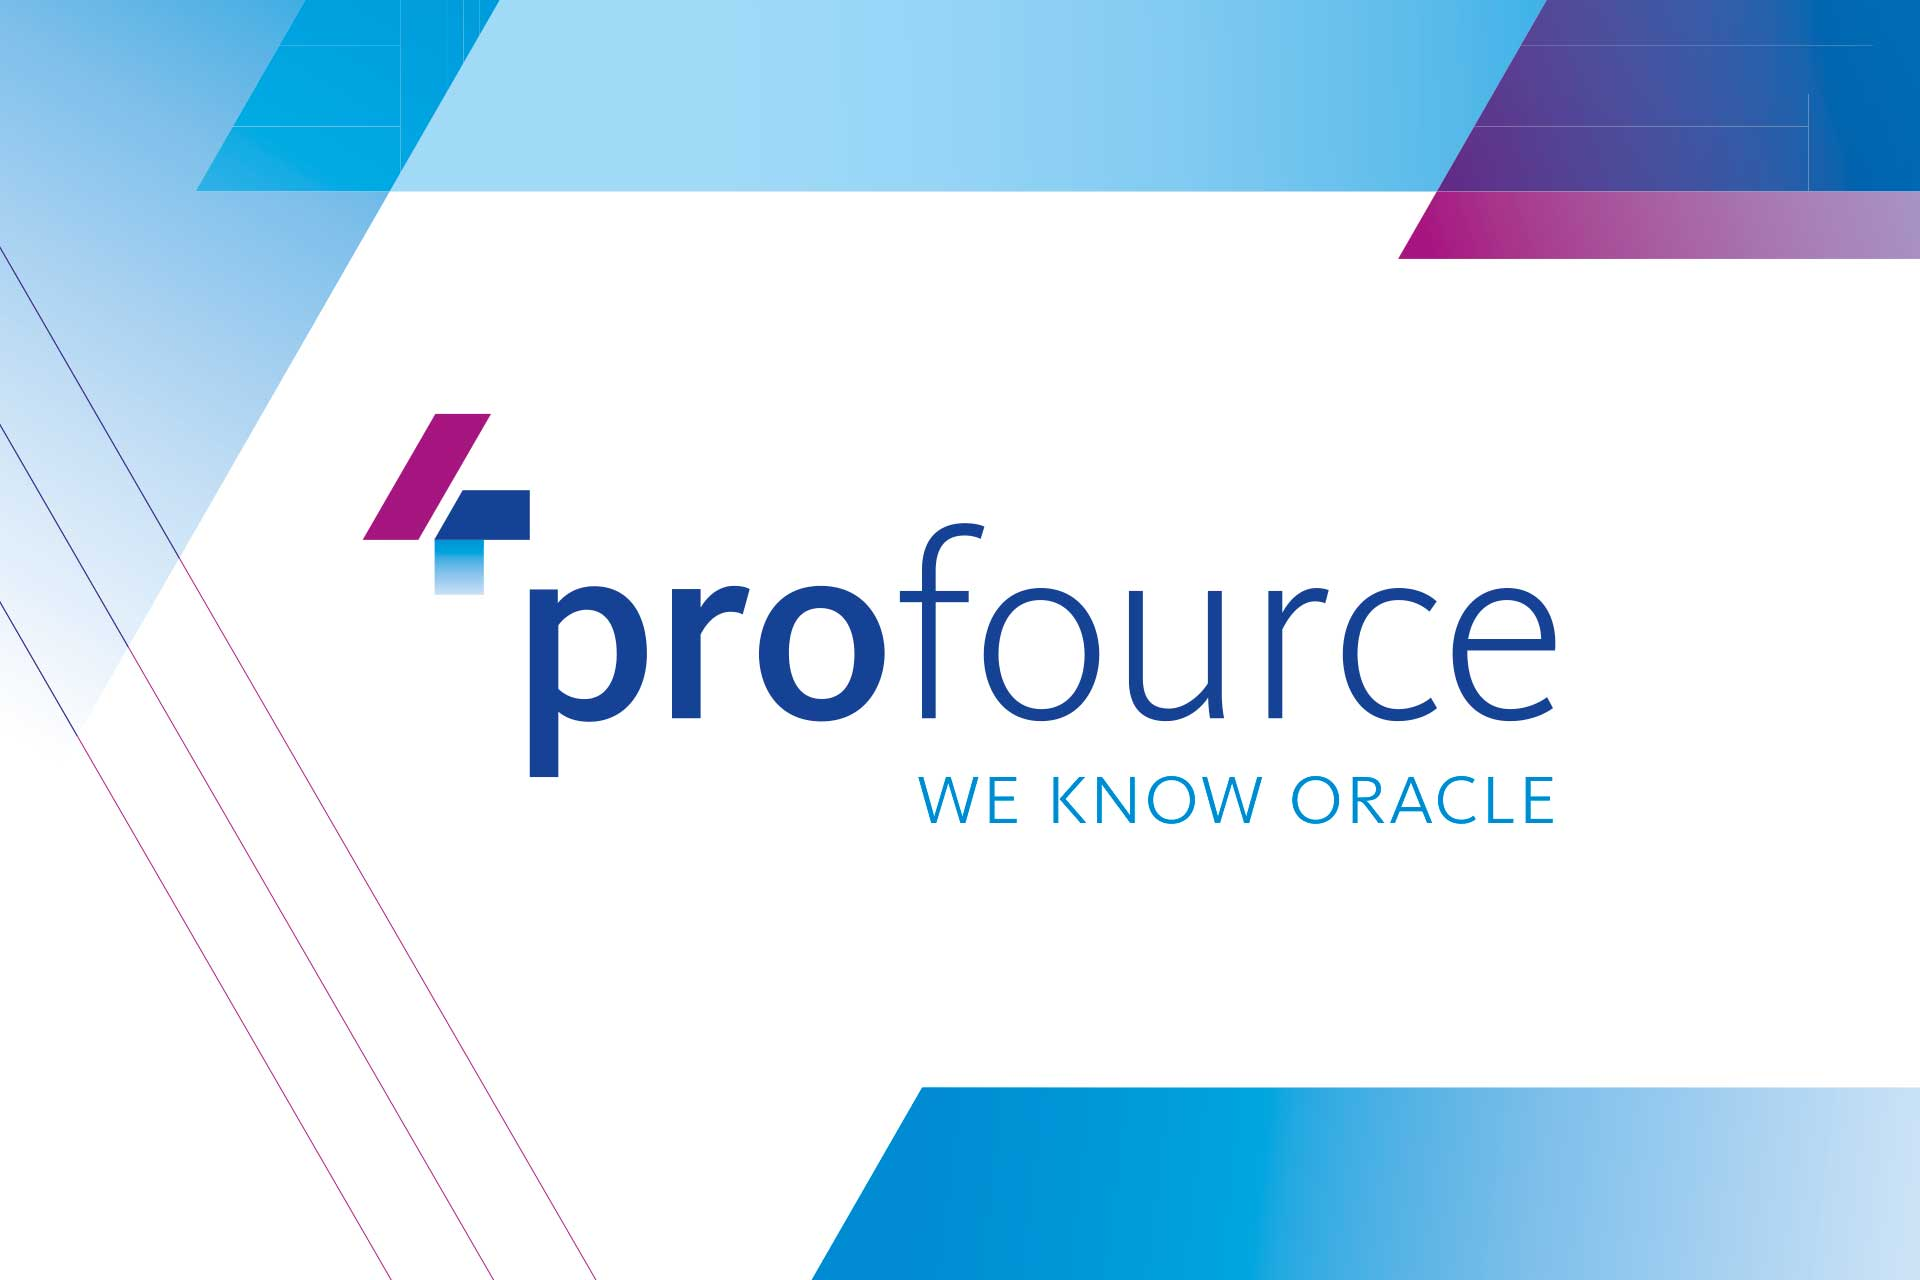 fit4finance-en-occ-verder-als-profource